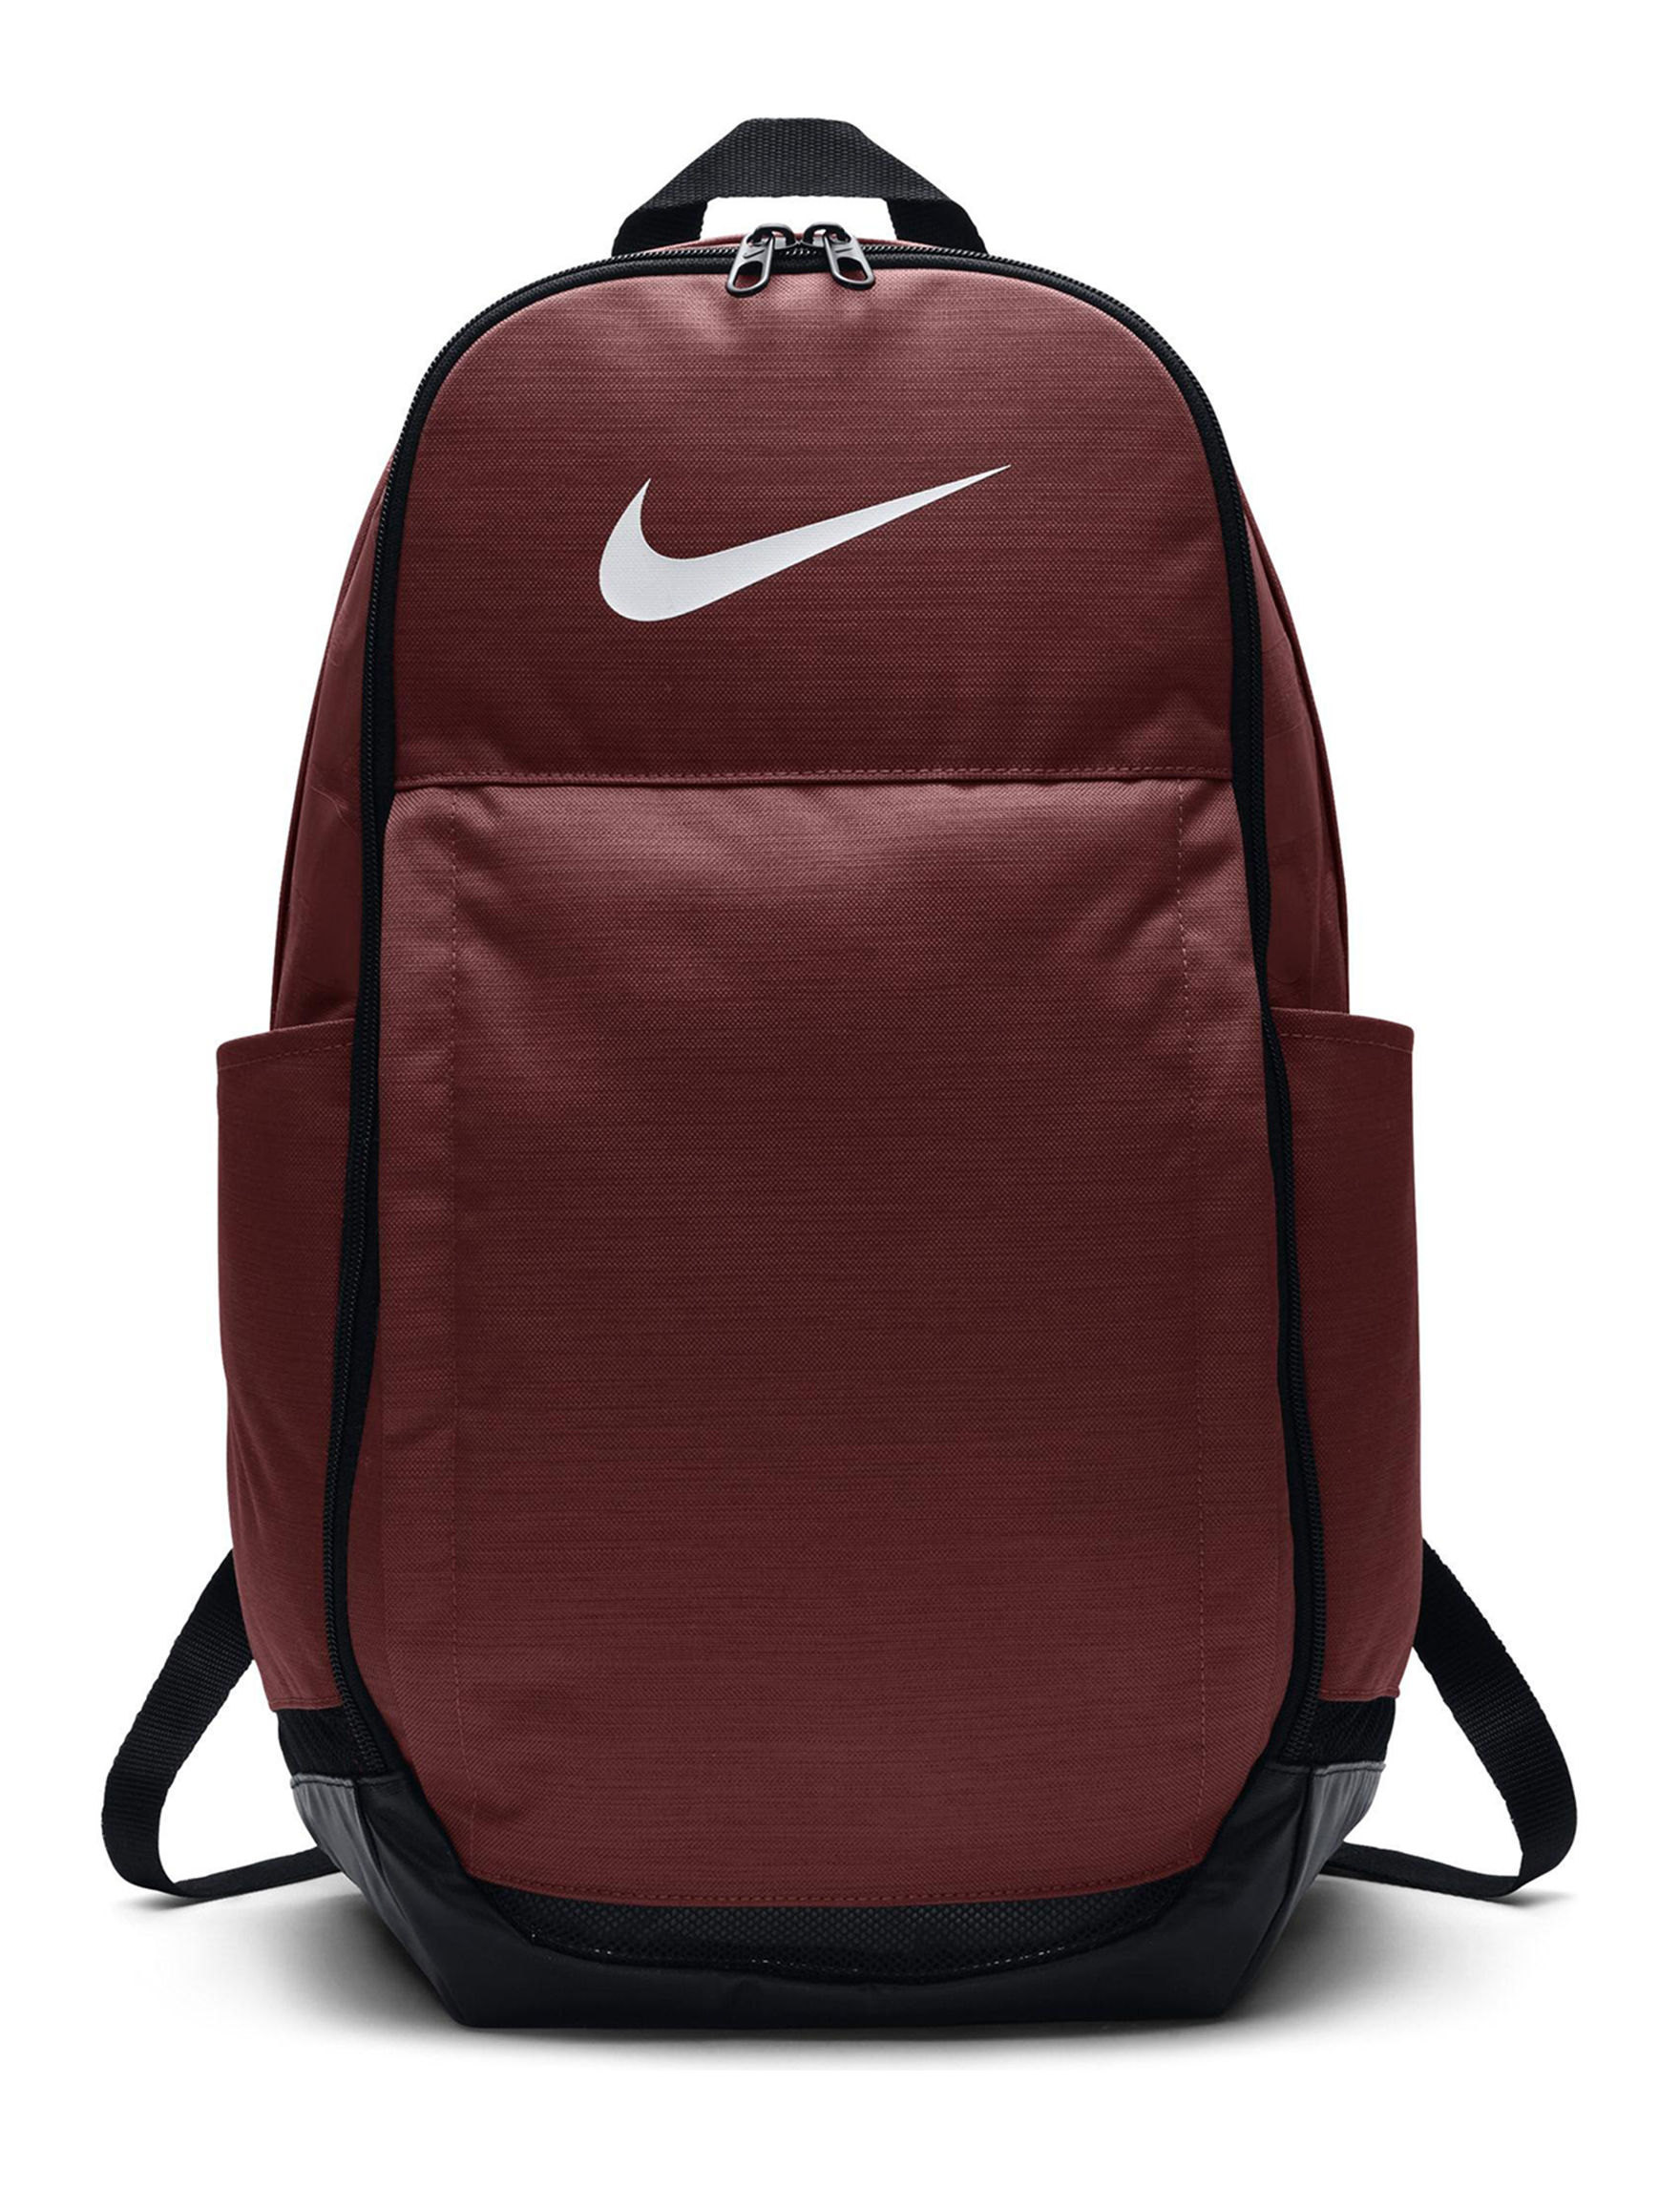 Nike Red / White Bookbags & Backpacks